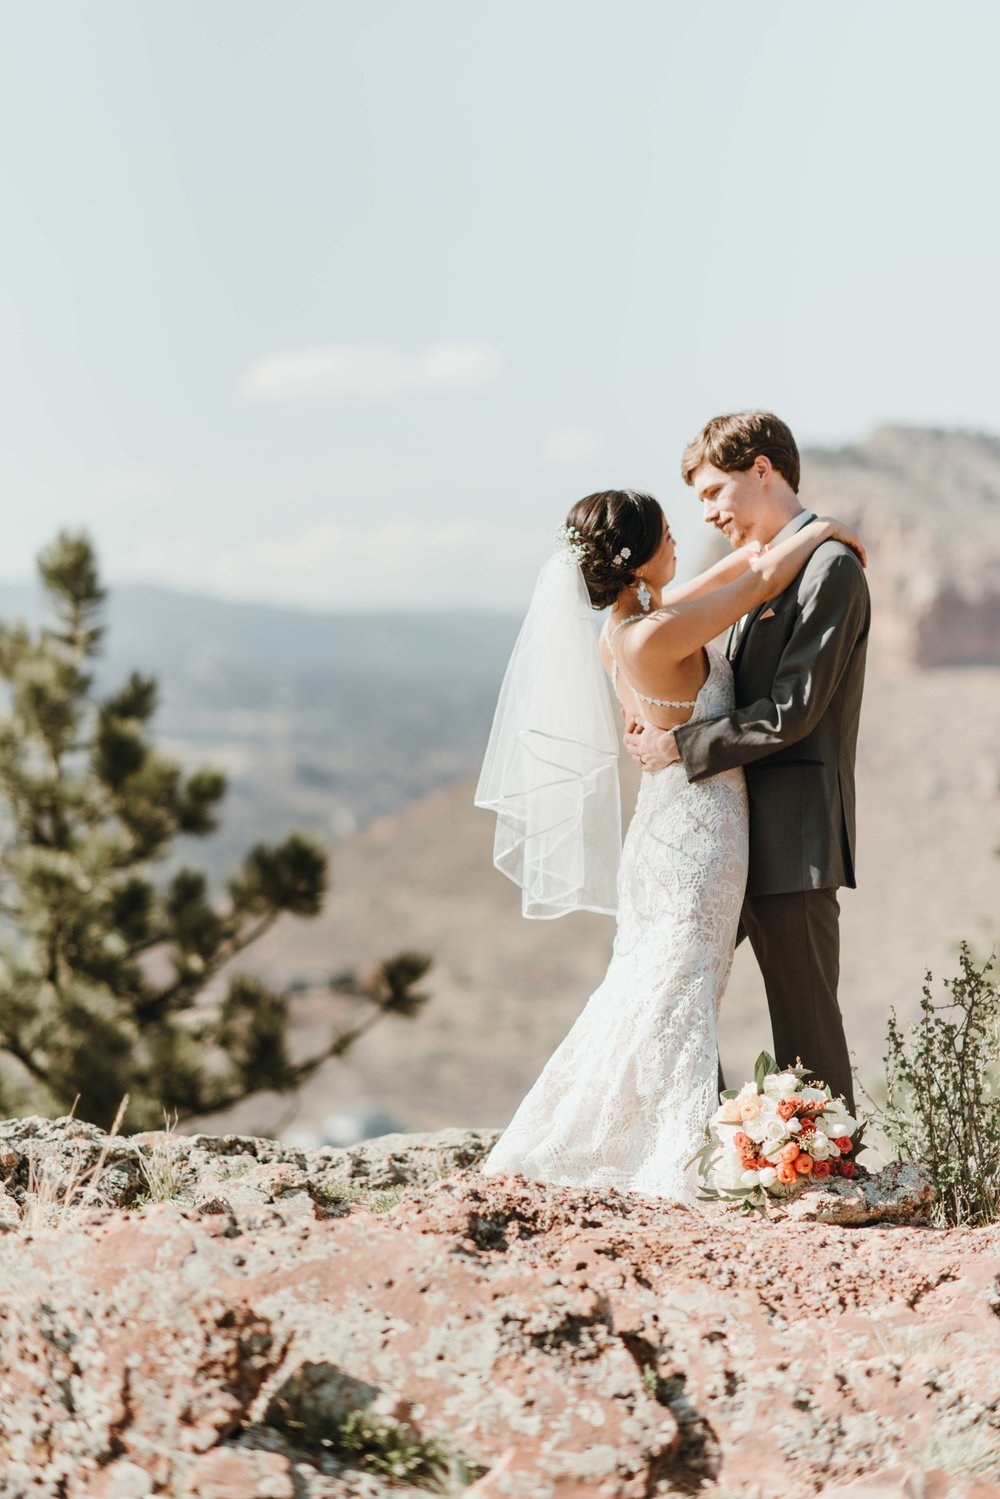 denver wedding photographer lioncrest manor in lyons ben and mali -DSC_1828.jpg